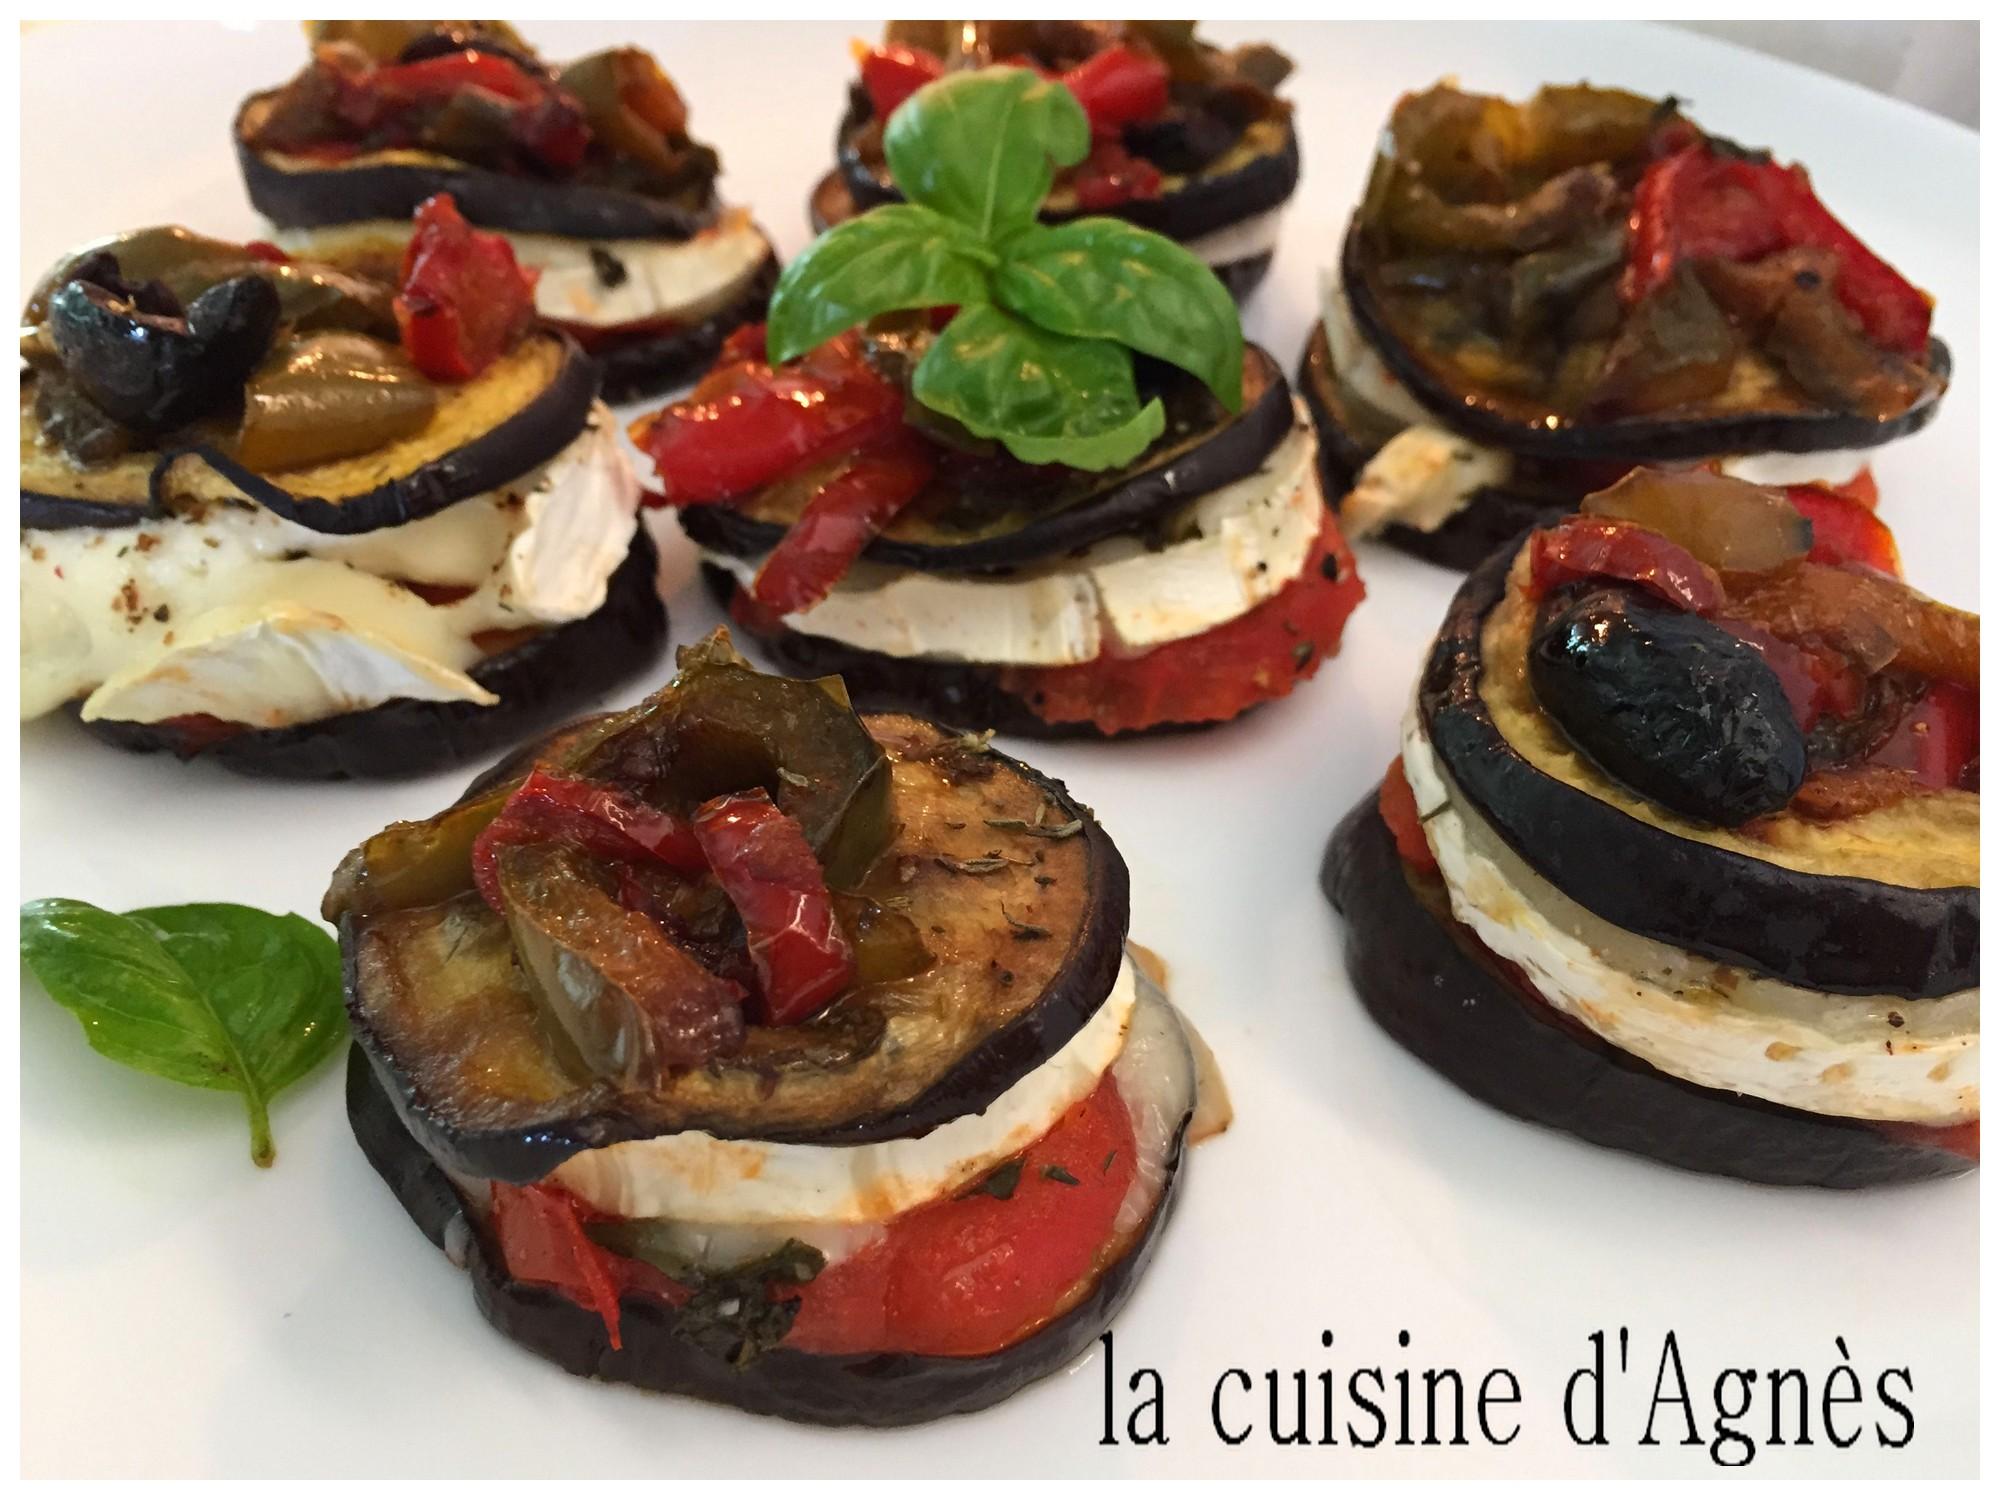 Millefeuille Aubergine Chevre La Cuisine D Agnesla Cuisine D Agnes